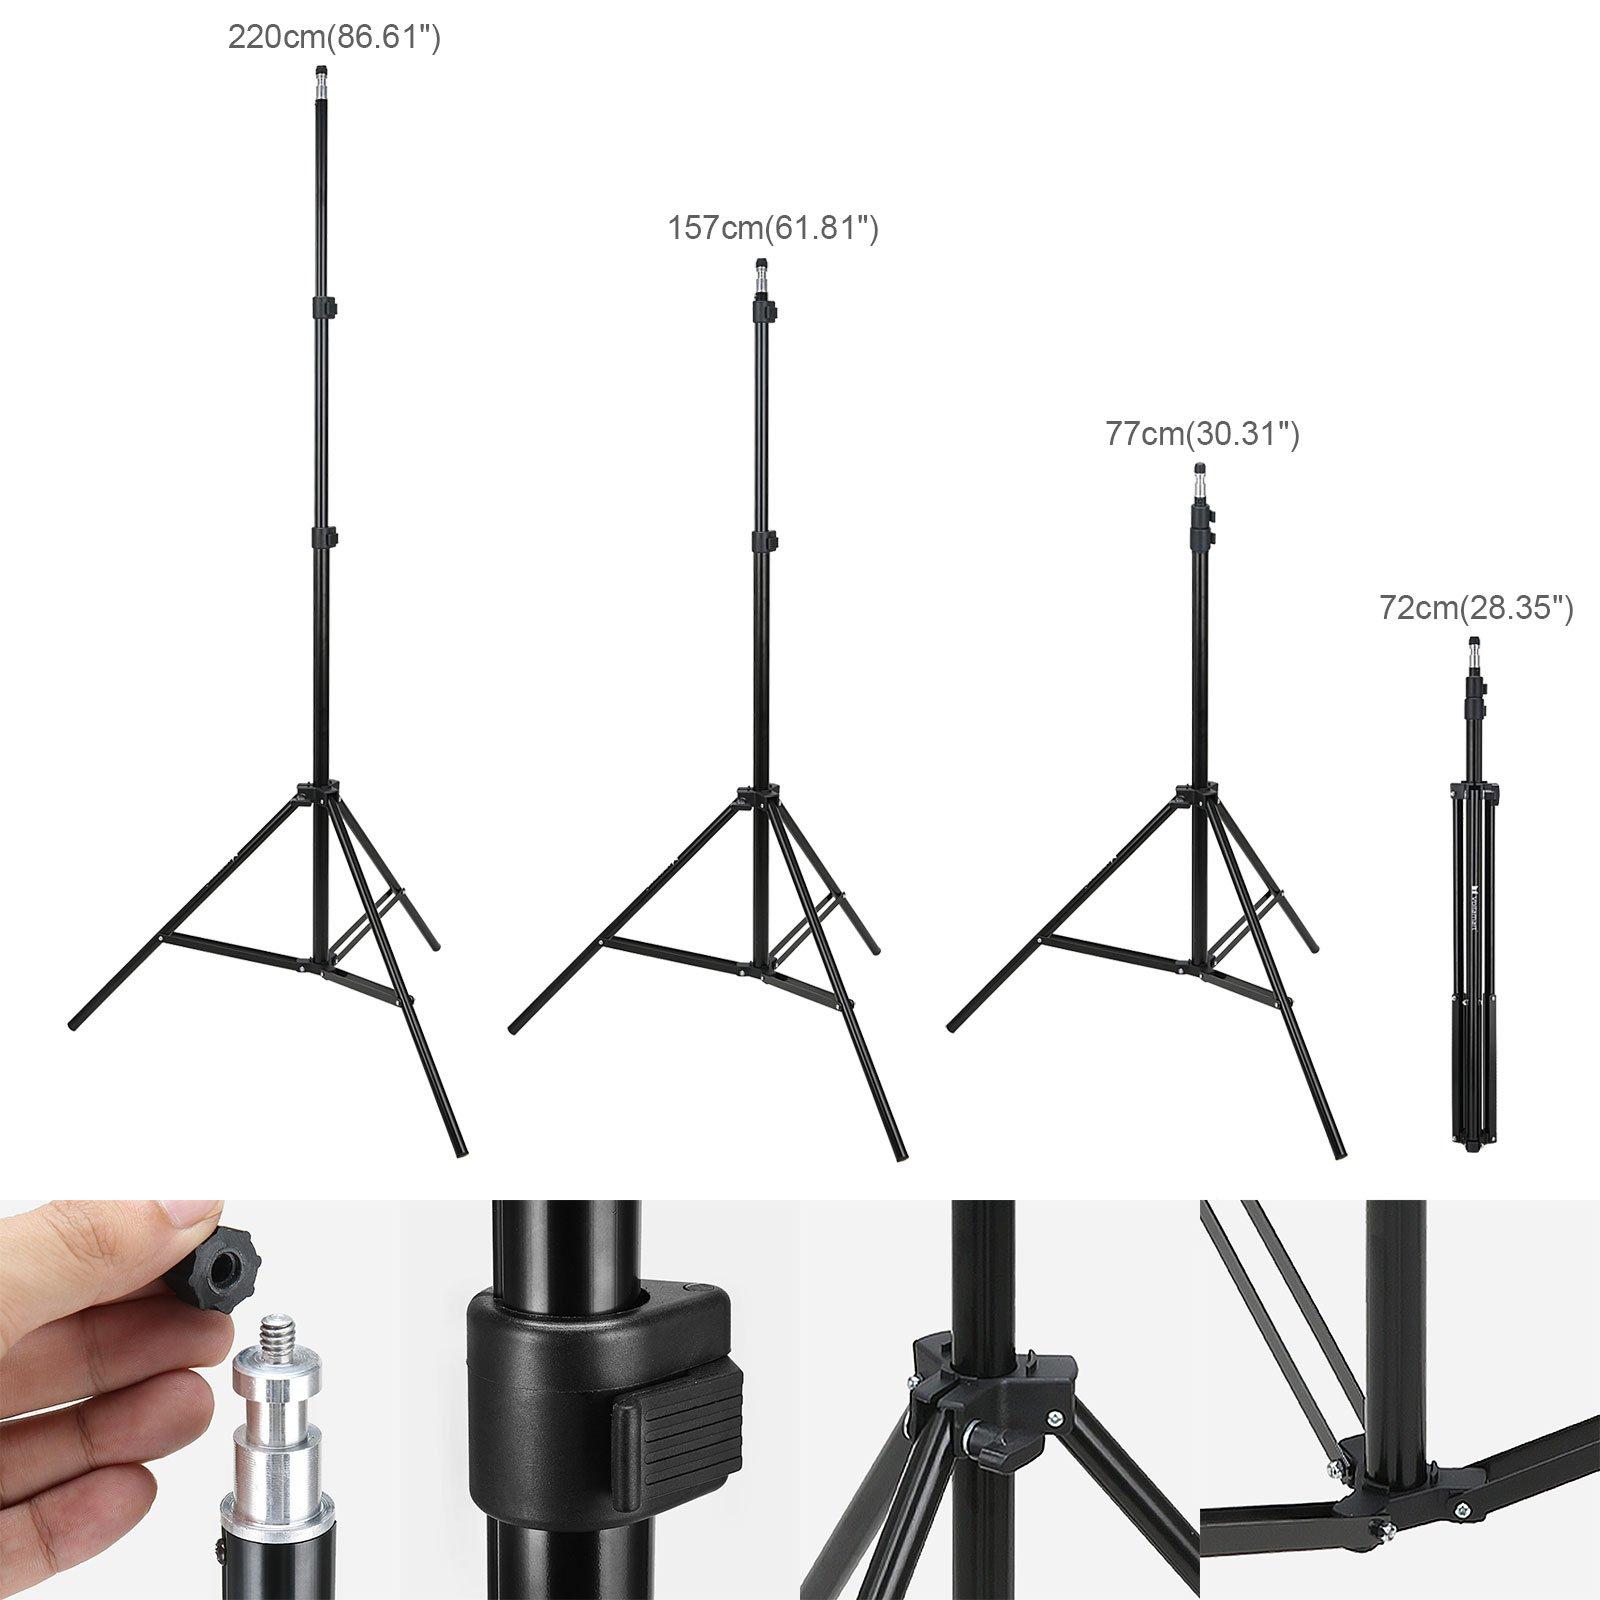 Voilamart Photography Umbrella Lighting Kit Continuous Lighting Soft Umbrella Kit 600W 5500K Day-Light Soft Umbrellas for Portrait Photography Studio and Video Shooting